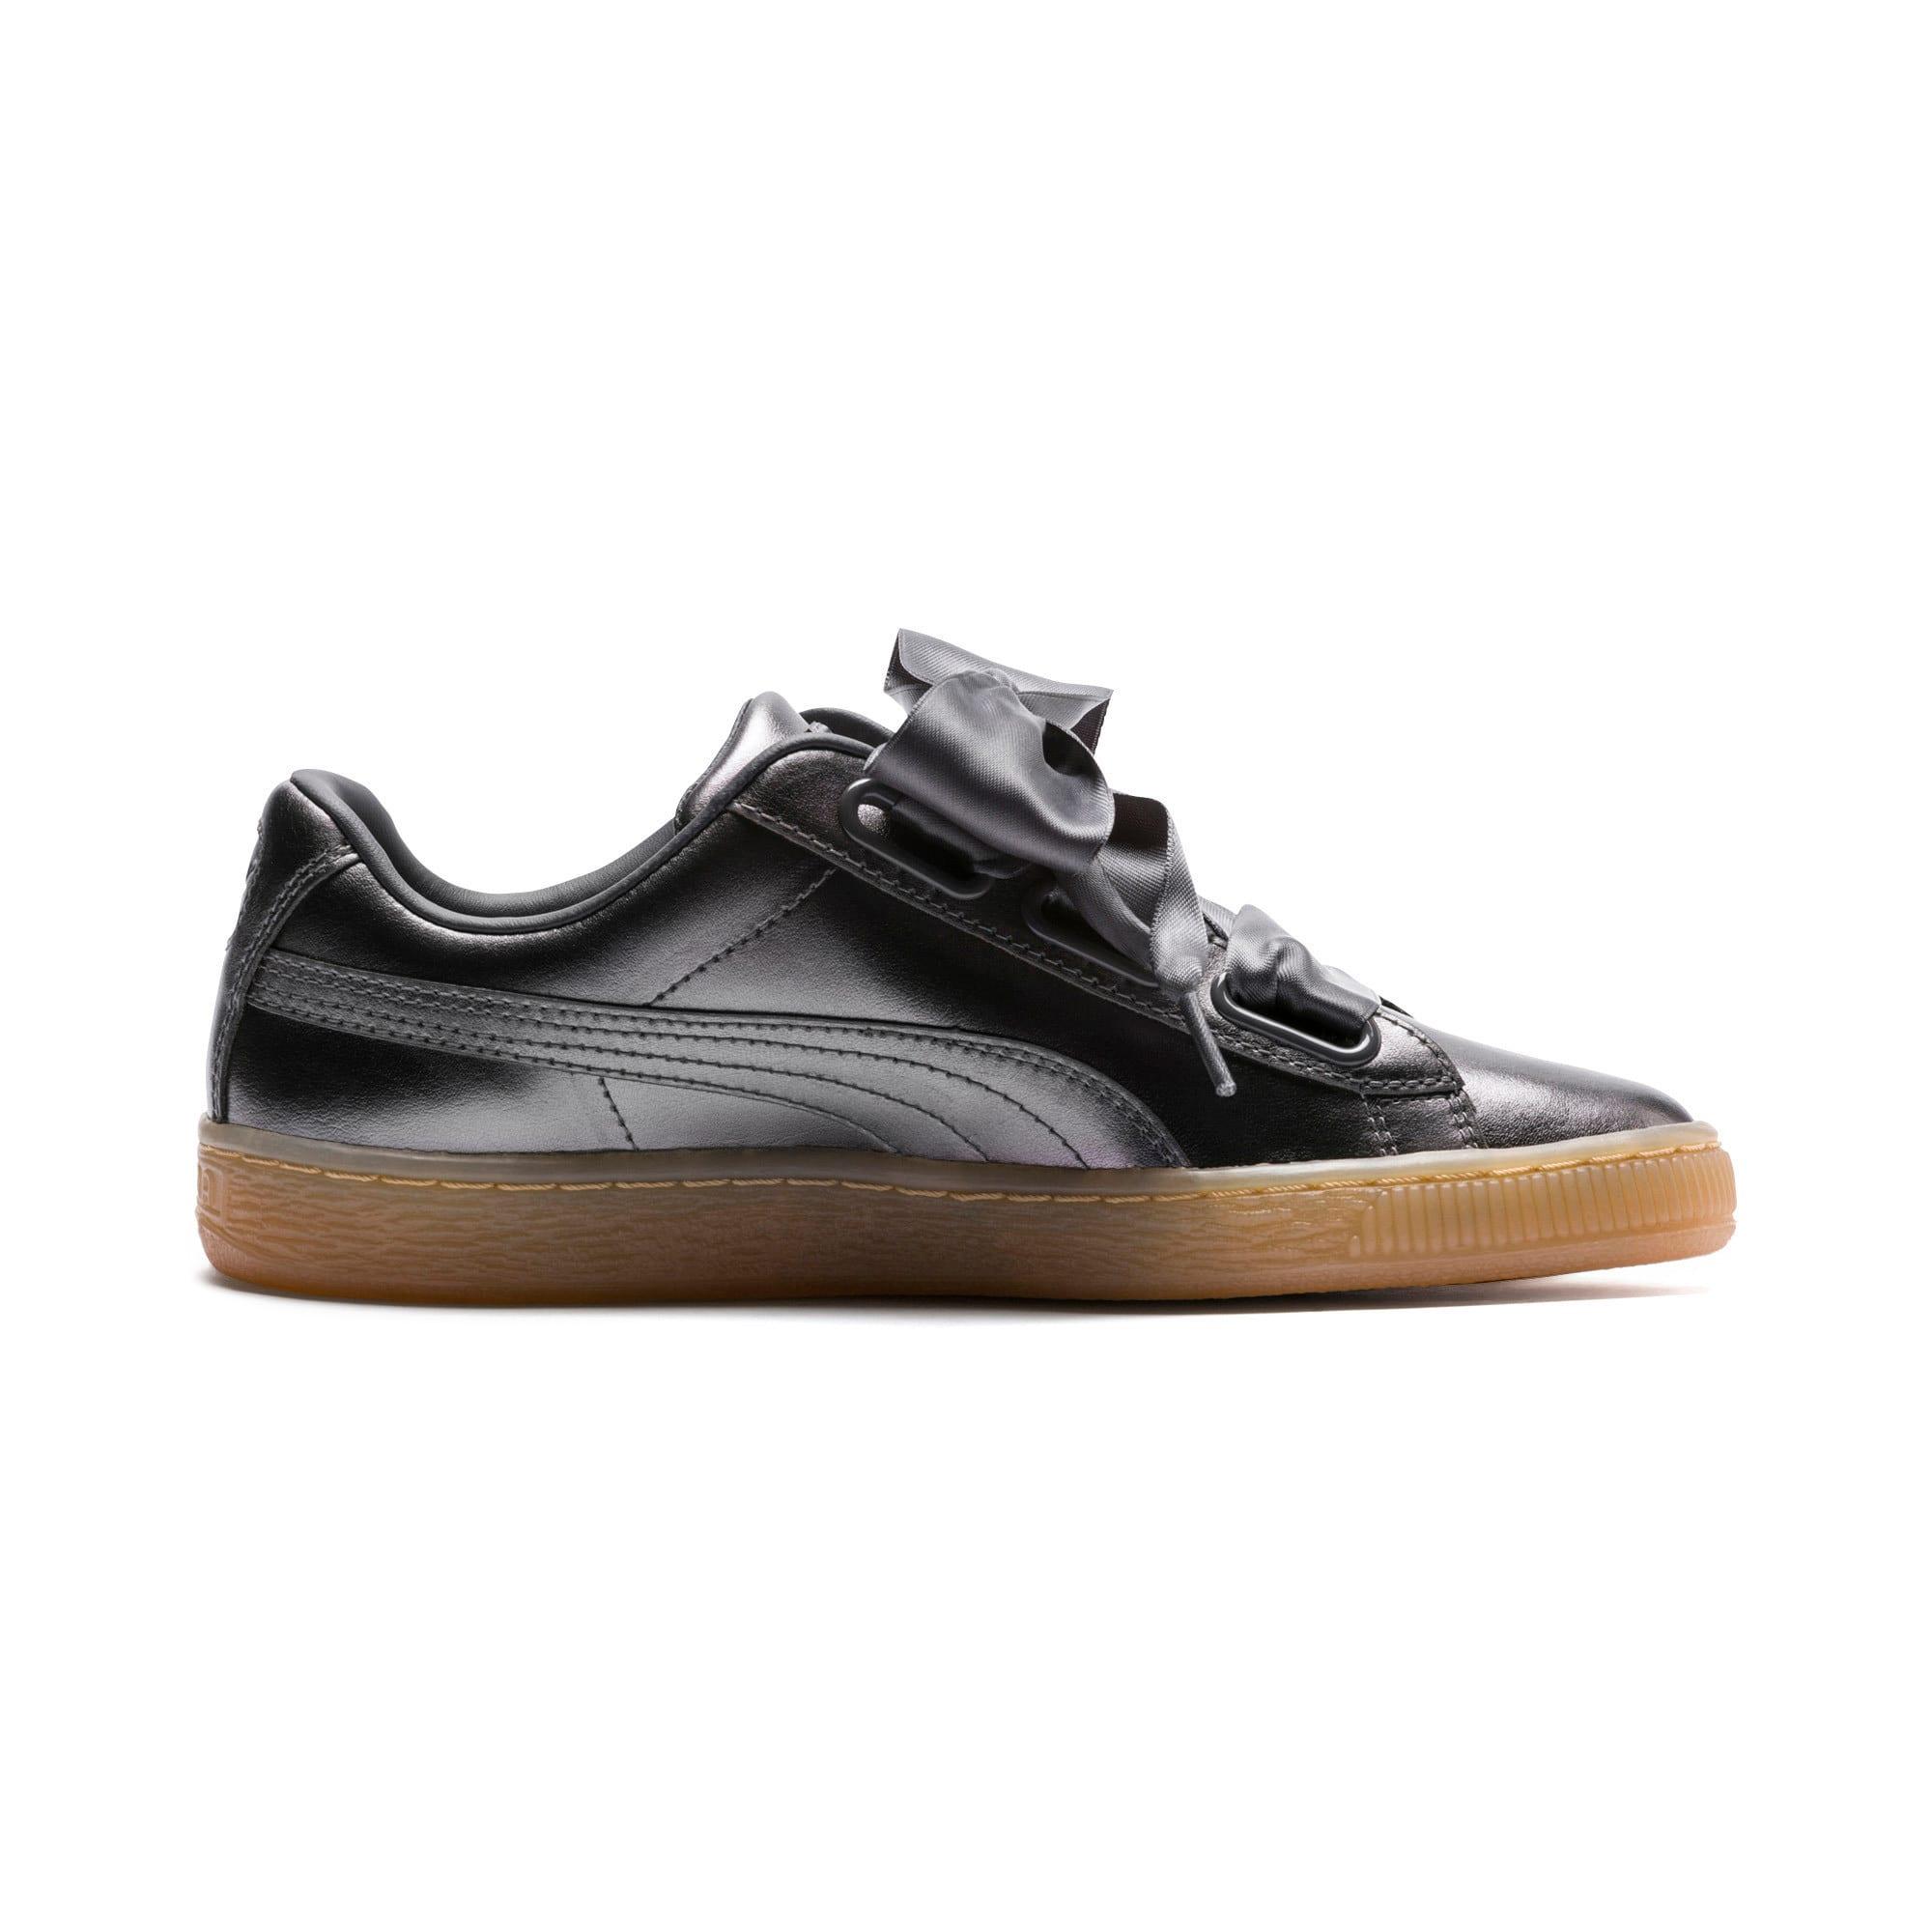 Thumbnail 5 of Basket Heart Luxe Women's Sneakers, QUIET SHADE-QUIET SHADE, medium